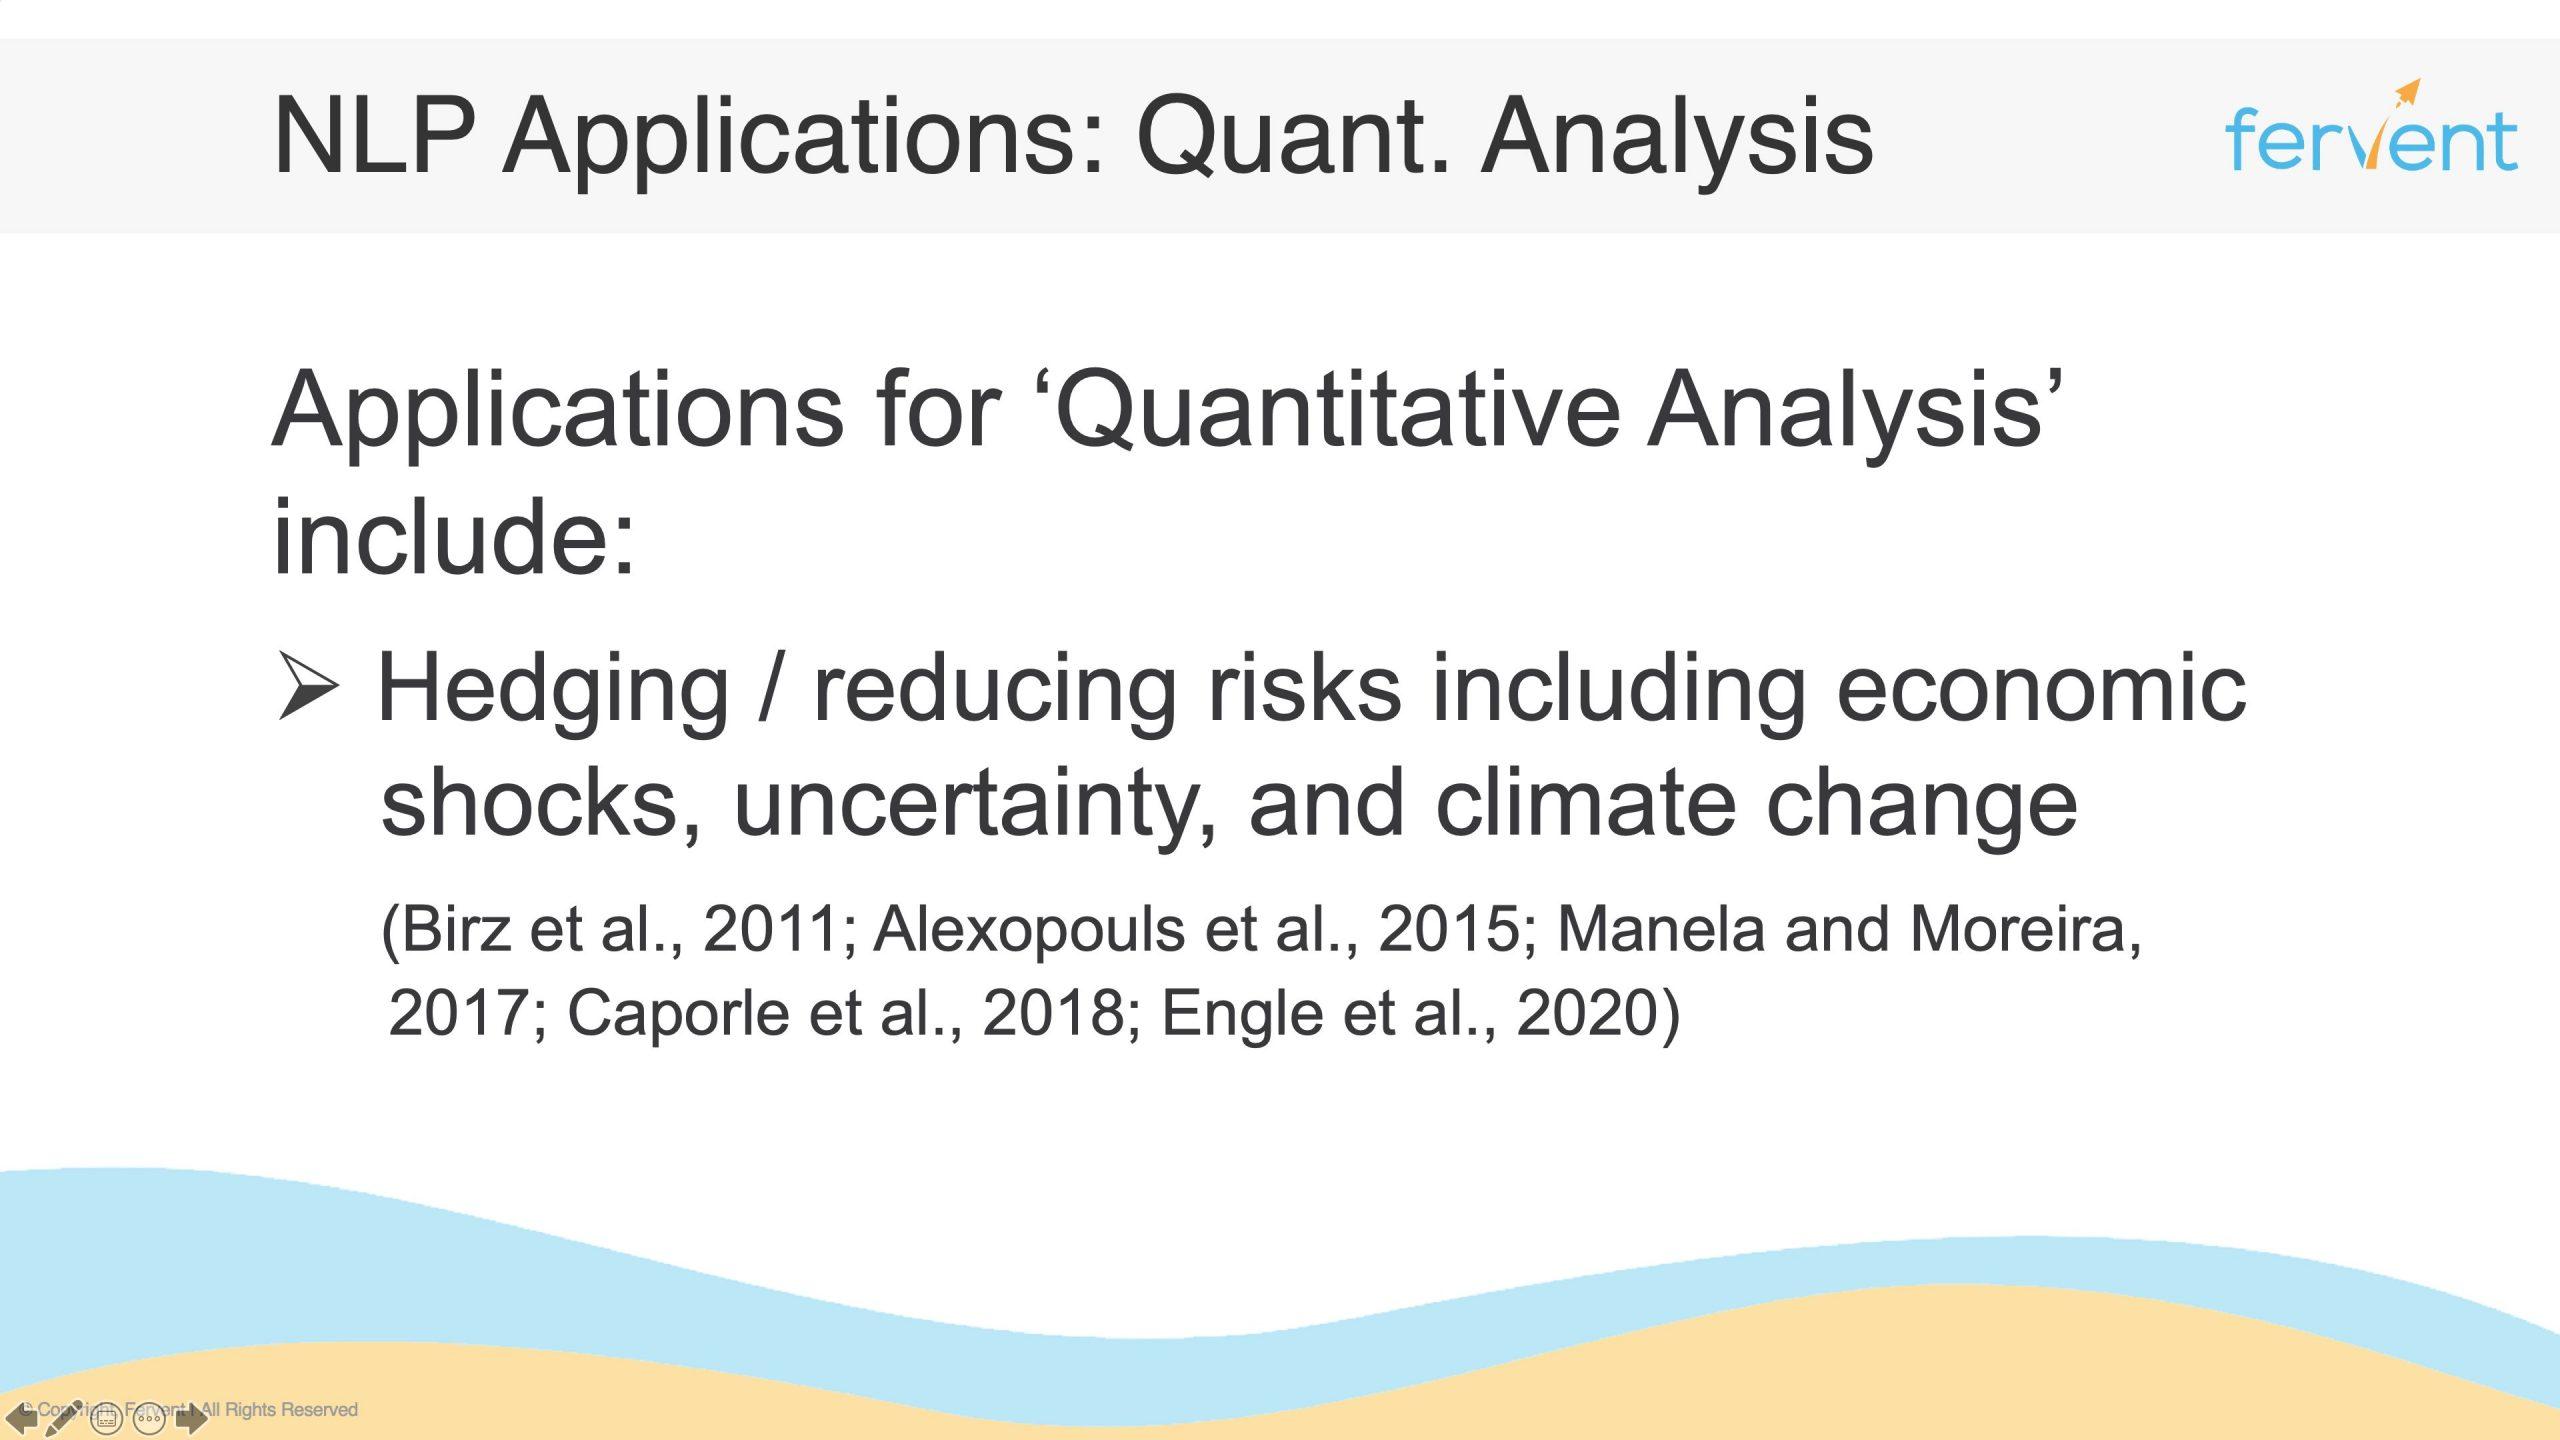 Slide showcasing NLP Applications in Finance for Quantitative Analysis